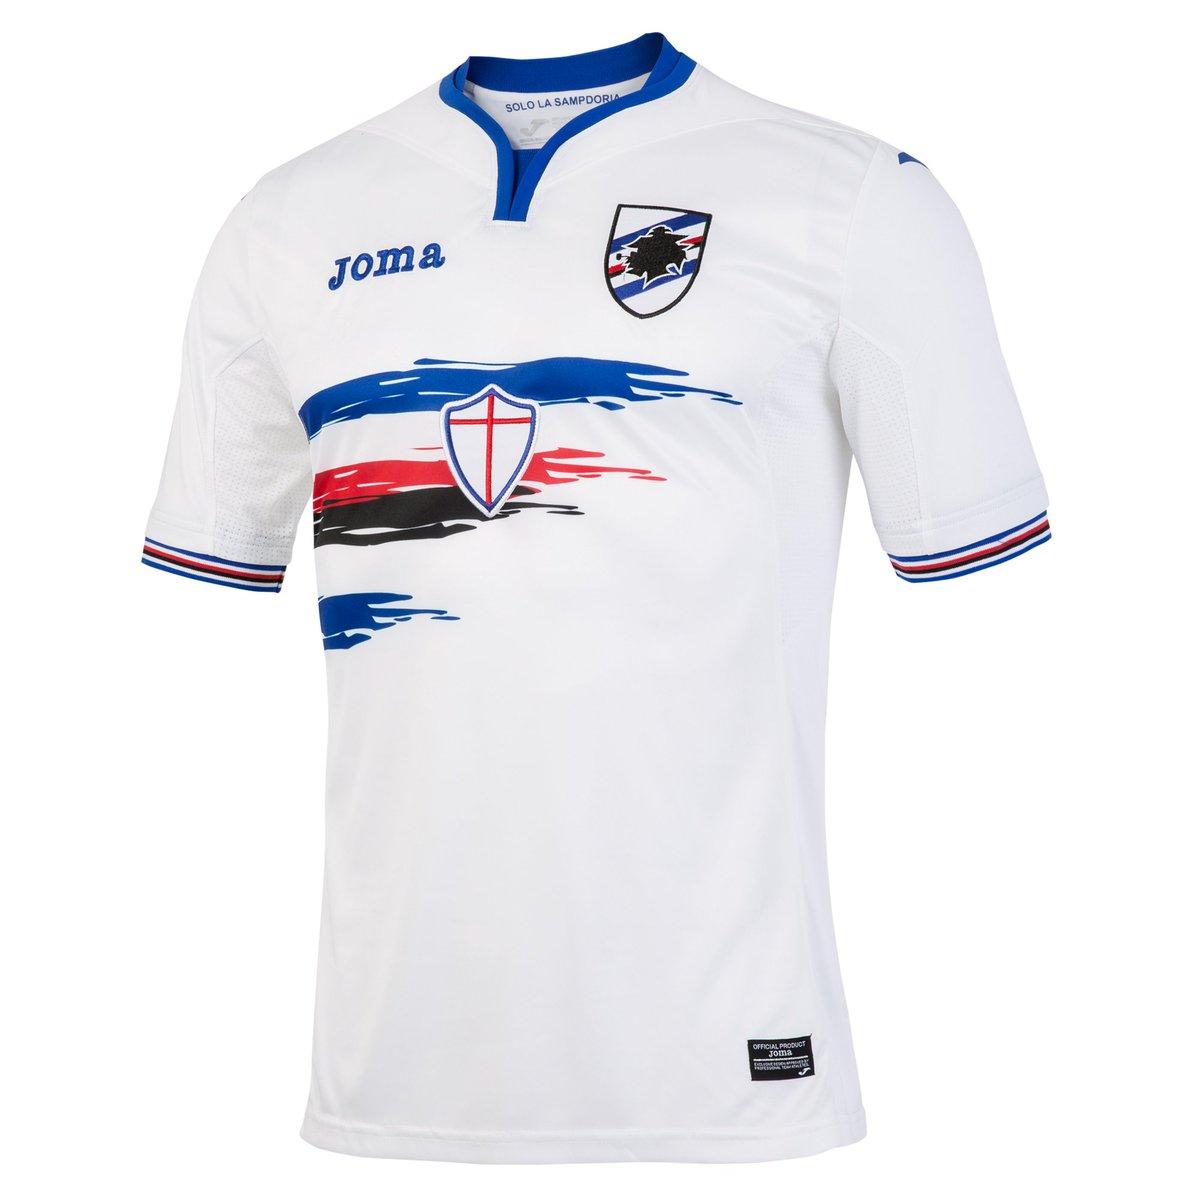 [2015/2016] Calcio CnUV6K0W8AAW7lN